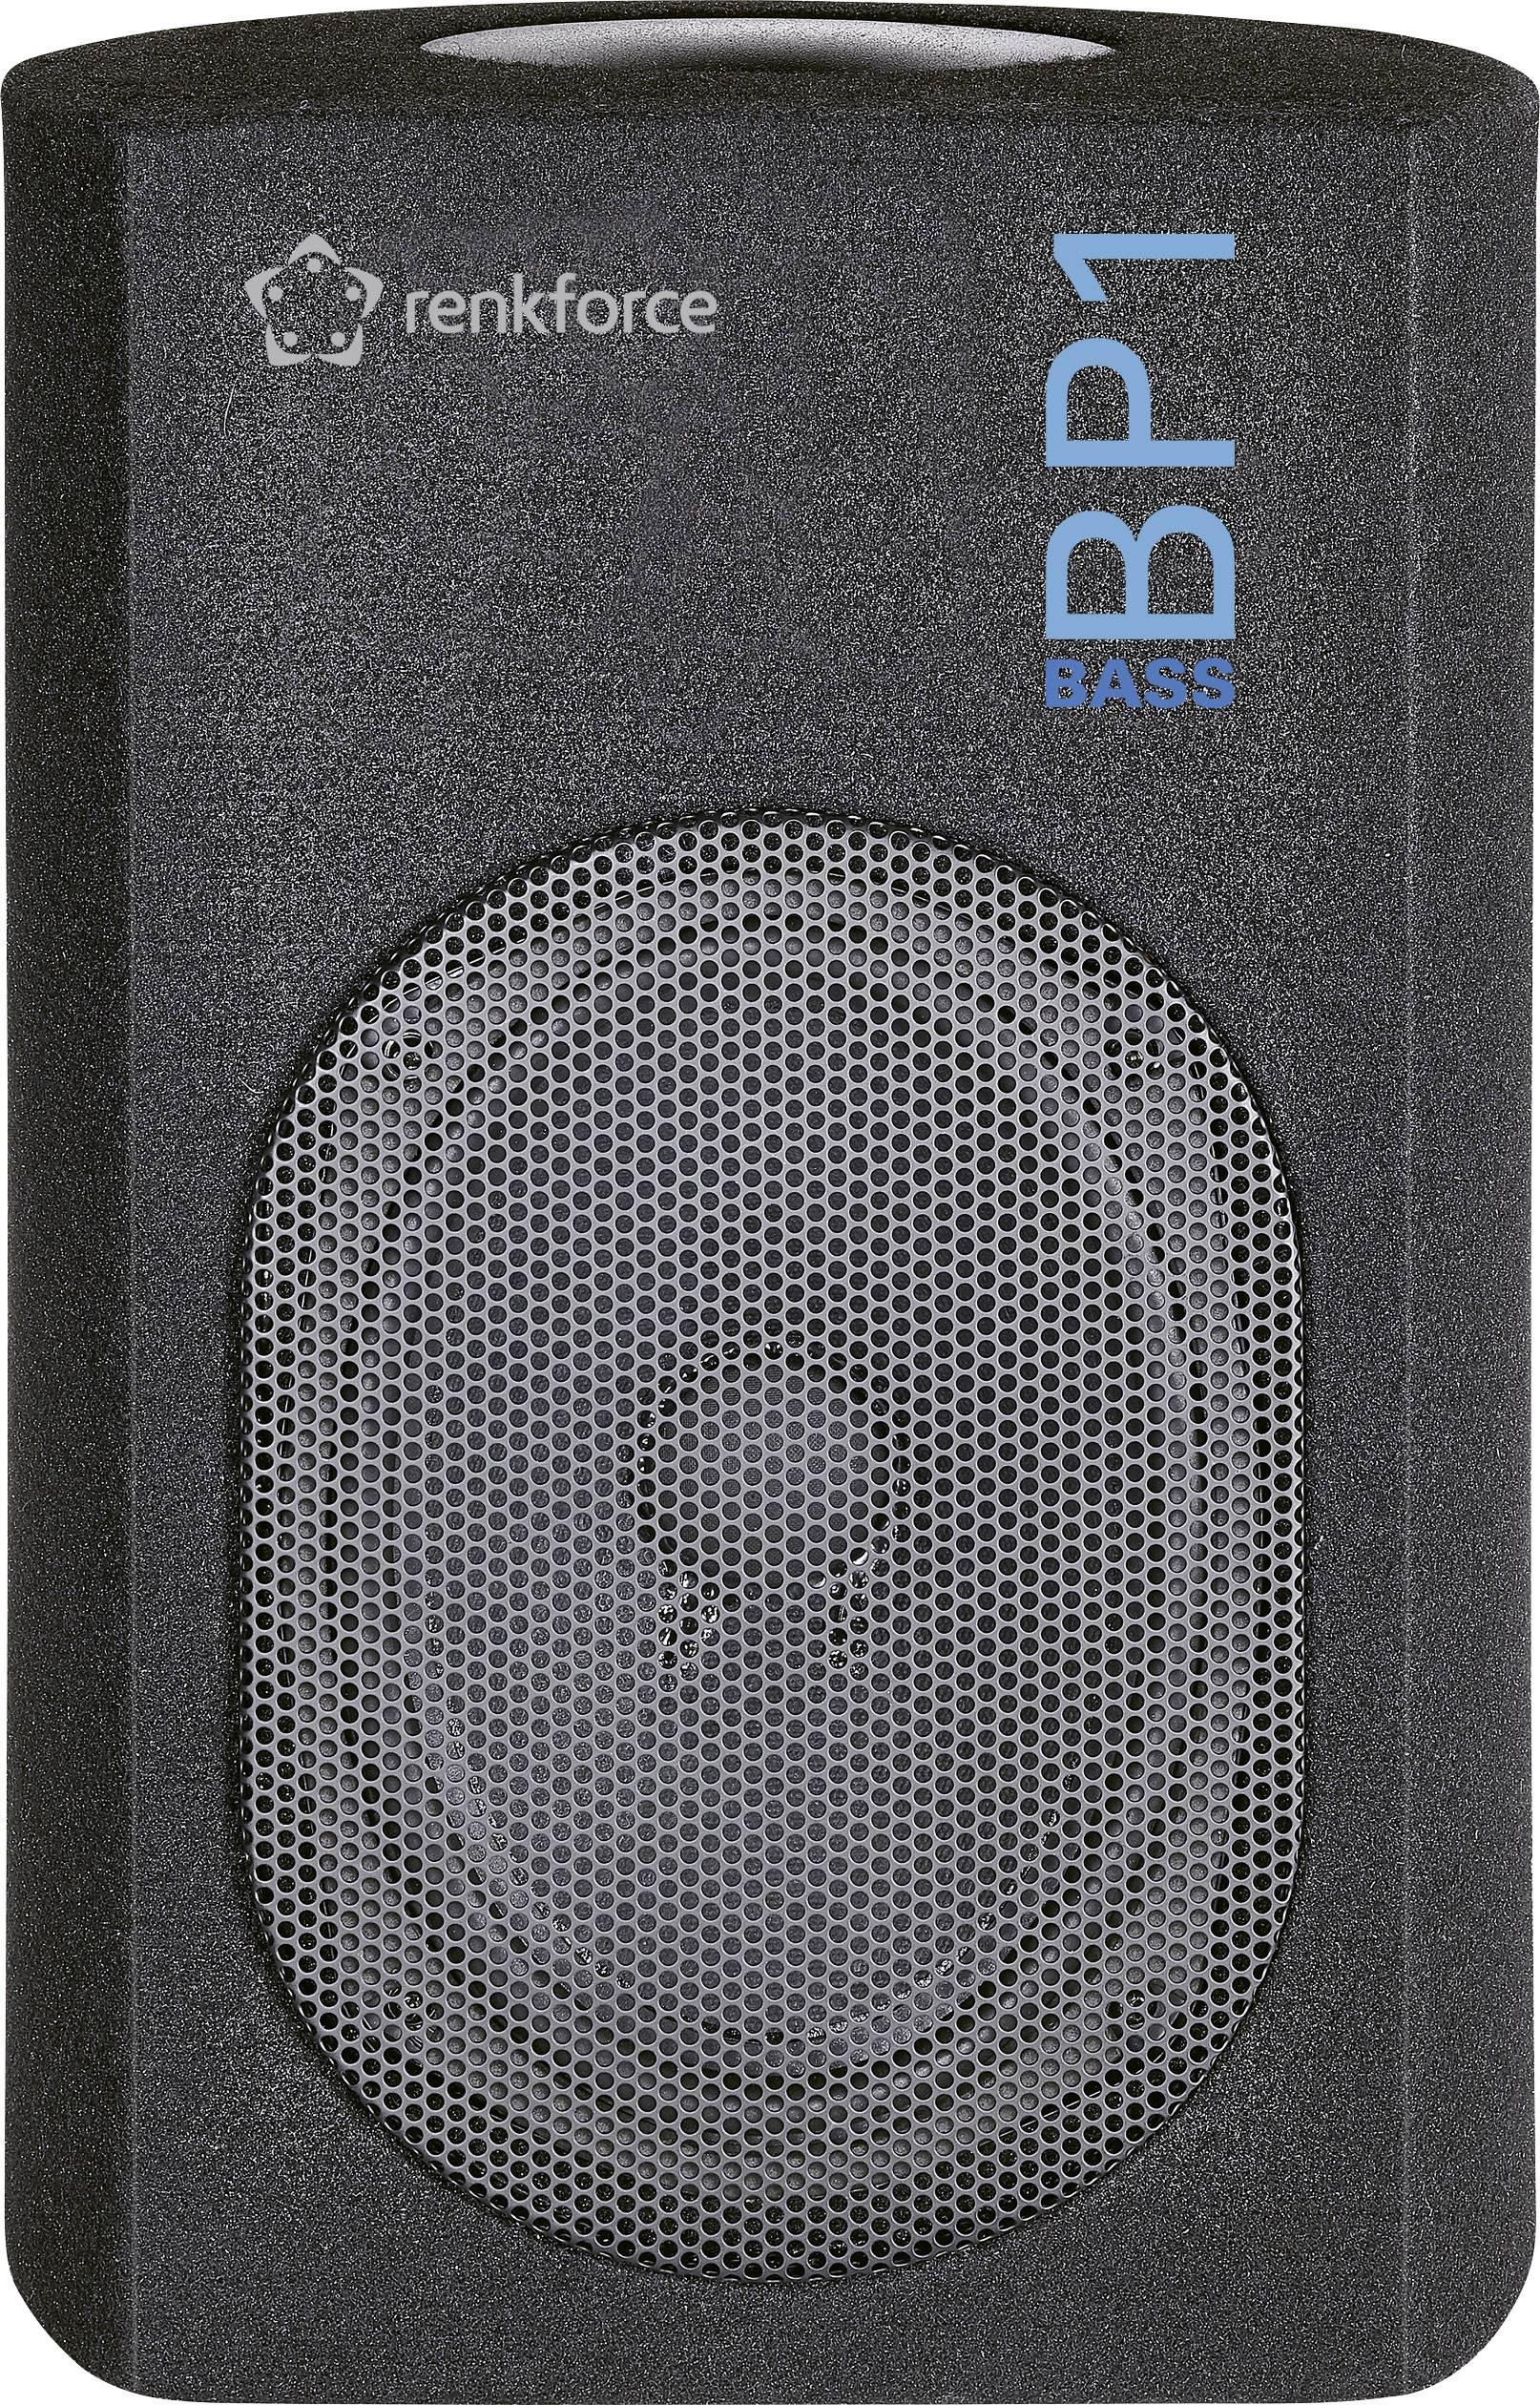 Pasívny subwoofer do auta Renkforce Bass BP1, 200 W